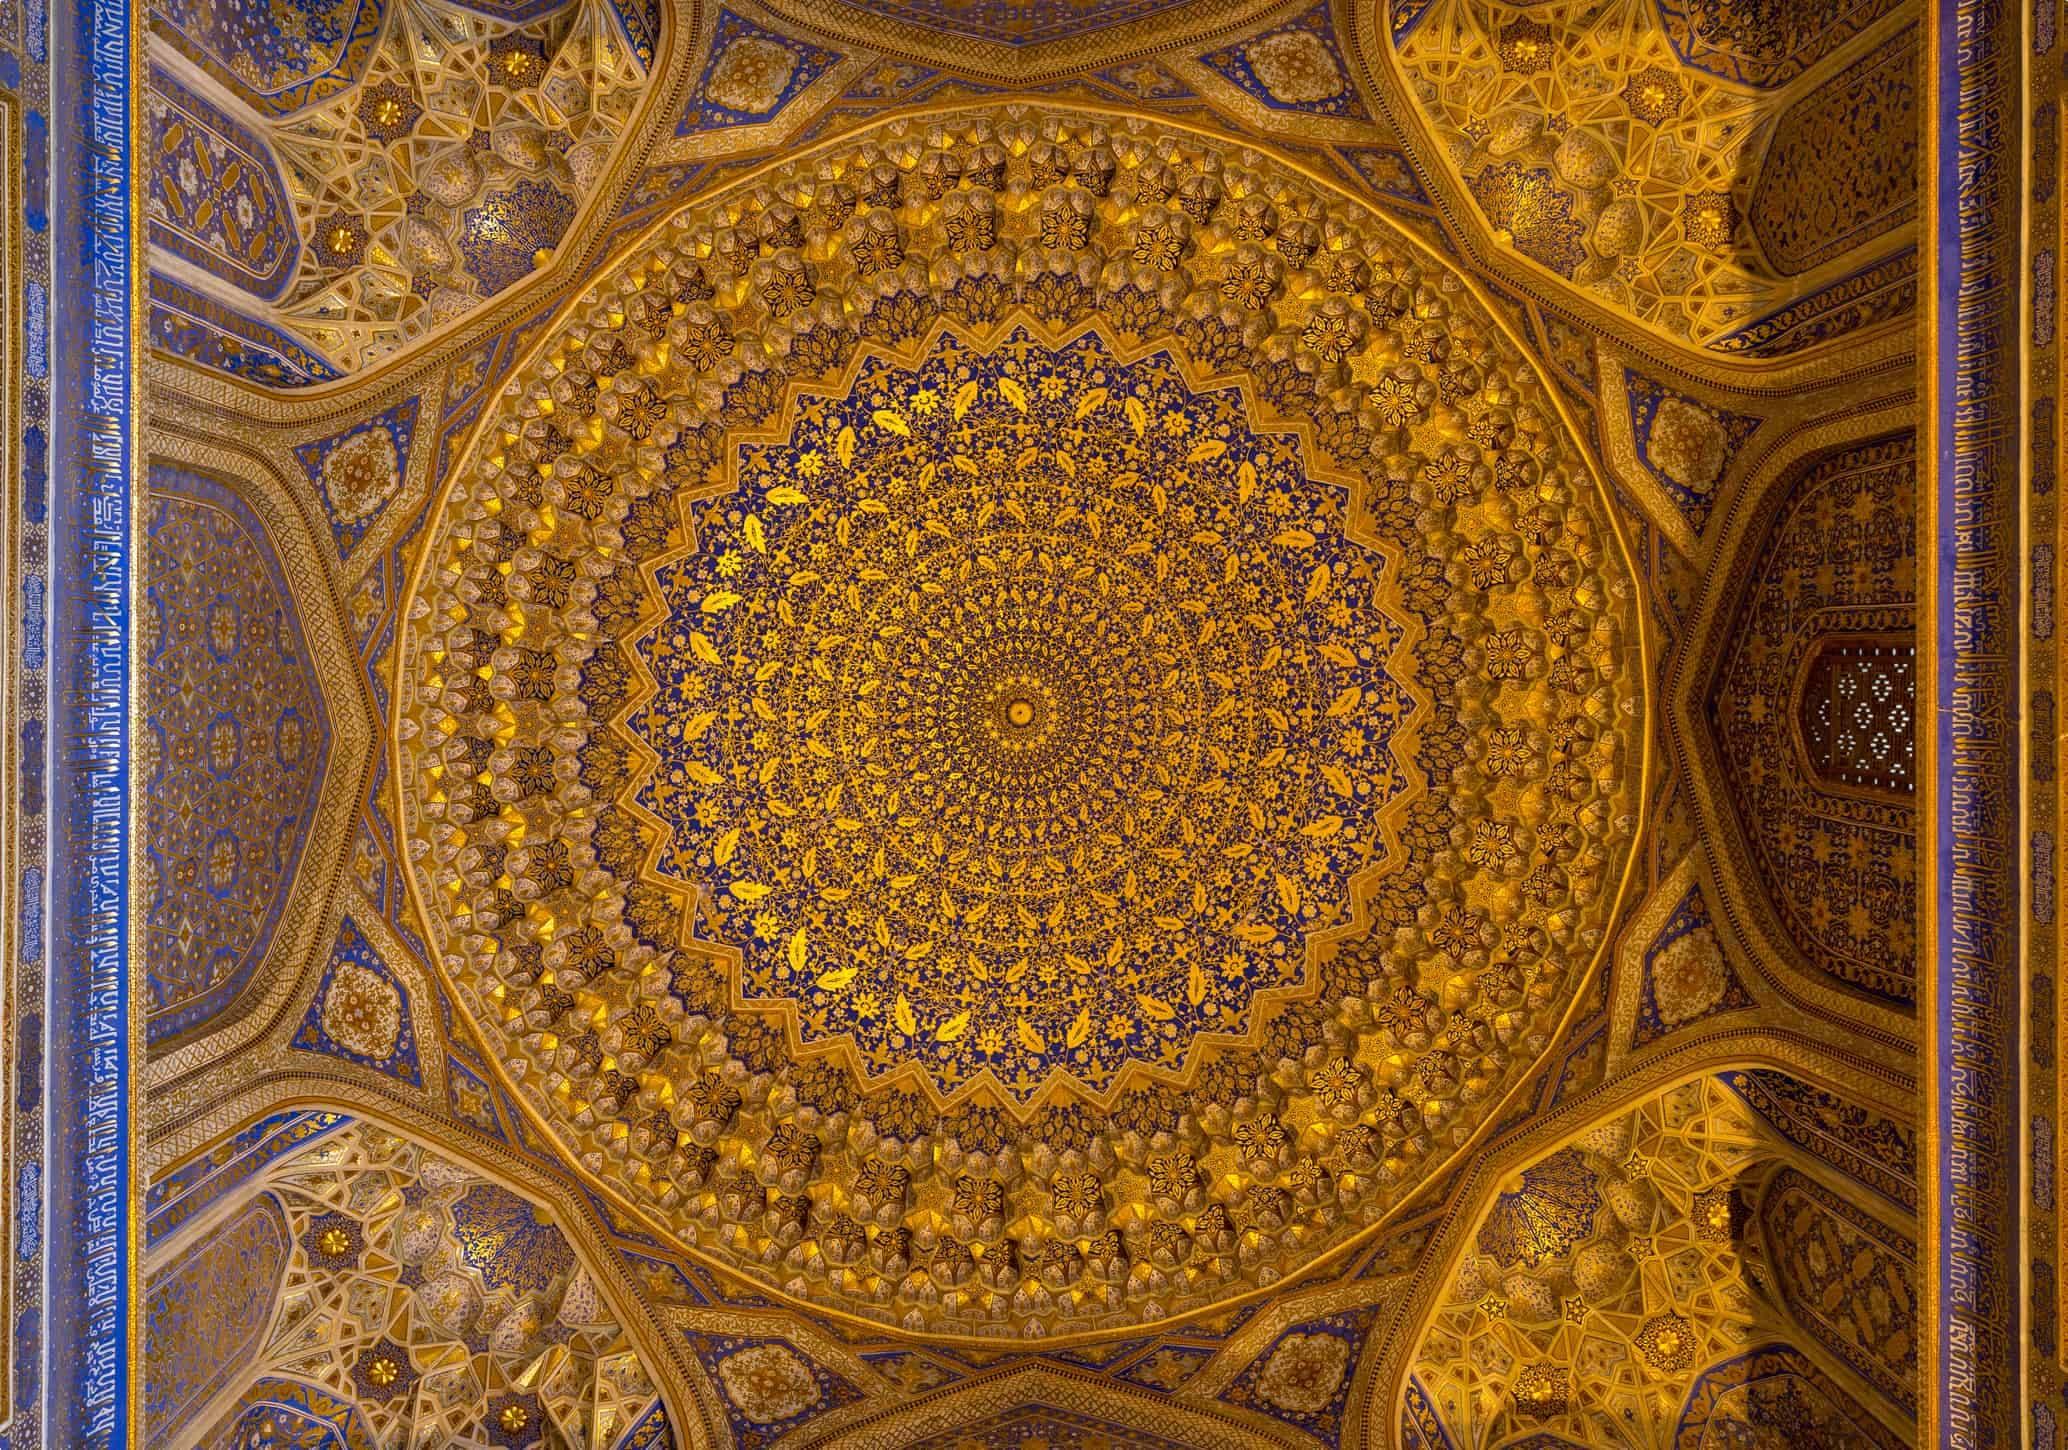 Ceiling of the Tilla Kari Mosque and Madrasa, Samarkand, Uzbekistan